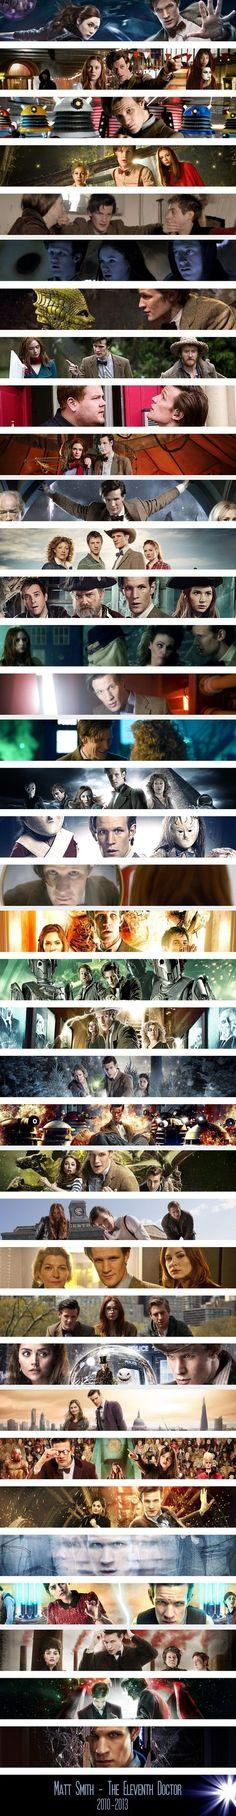 Matt Smith - The Eleventh Doctor ||| 2010 - 2013